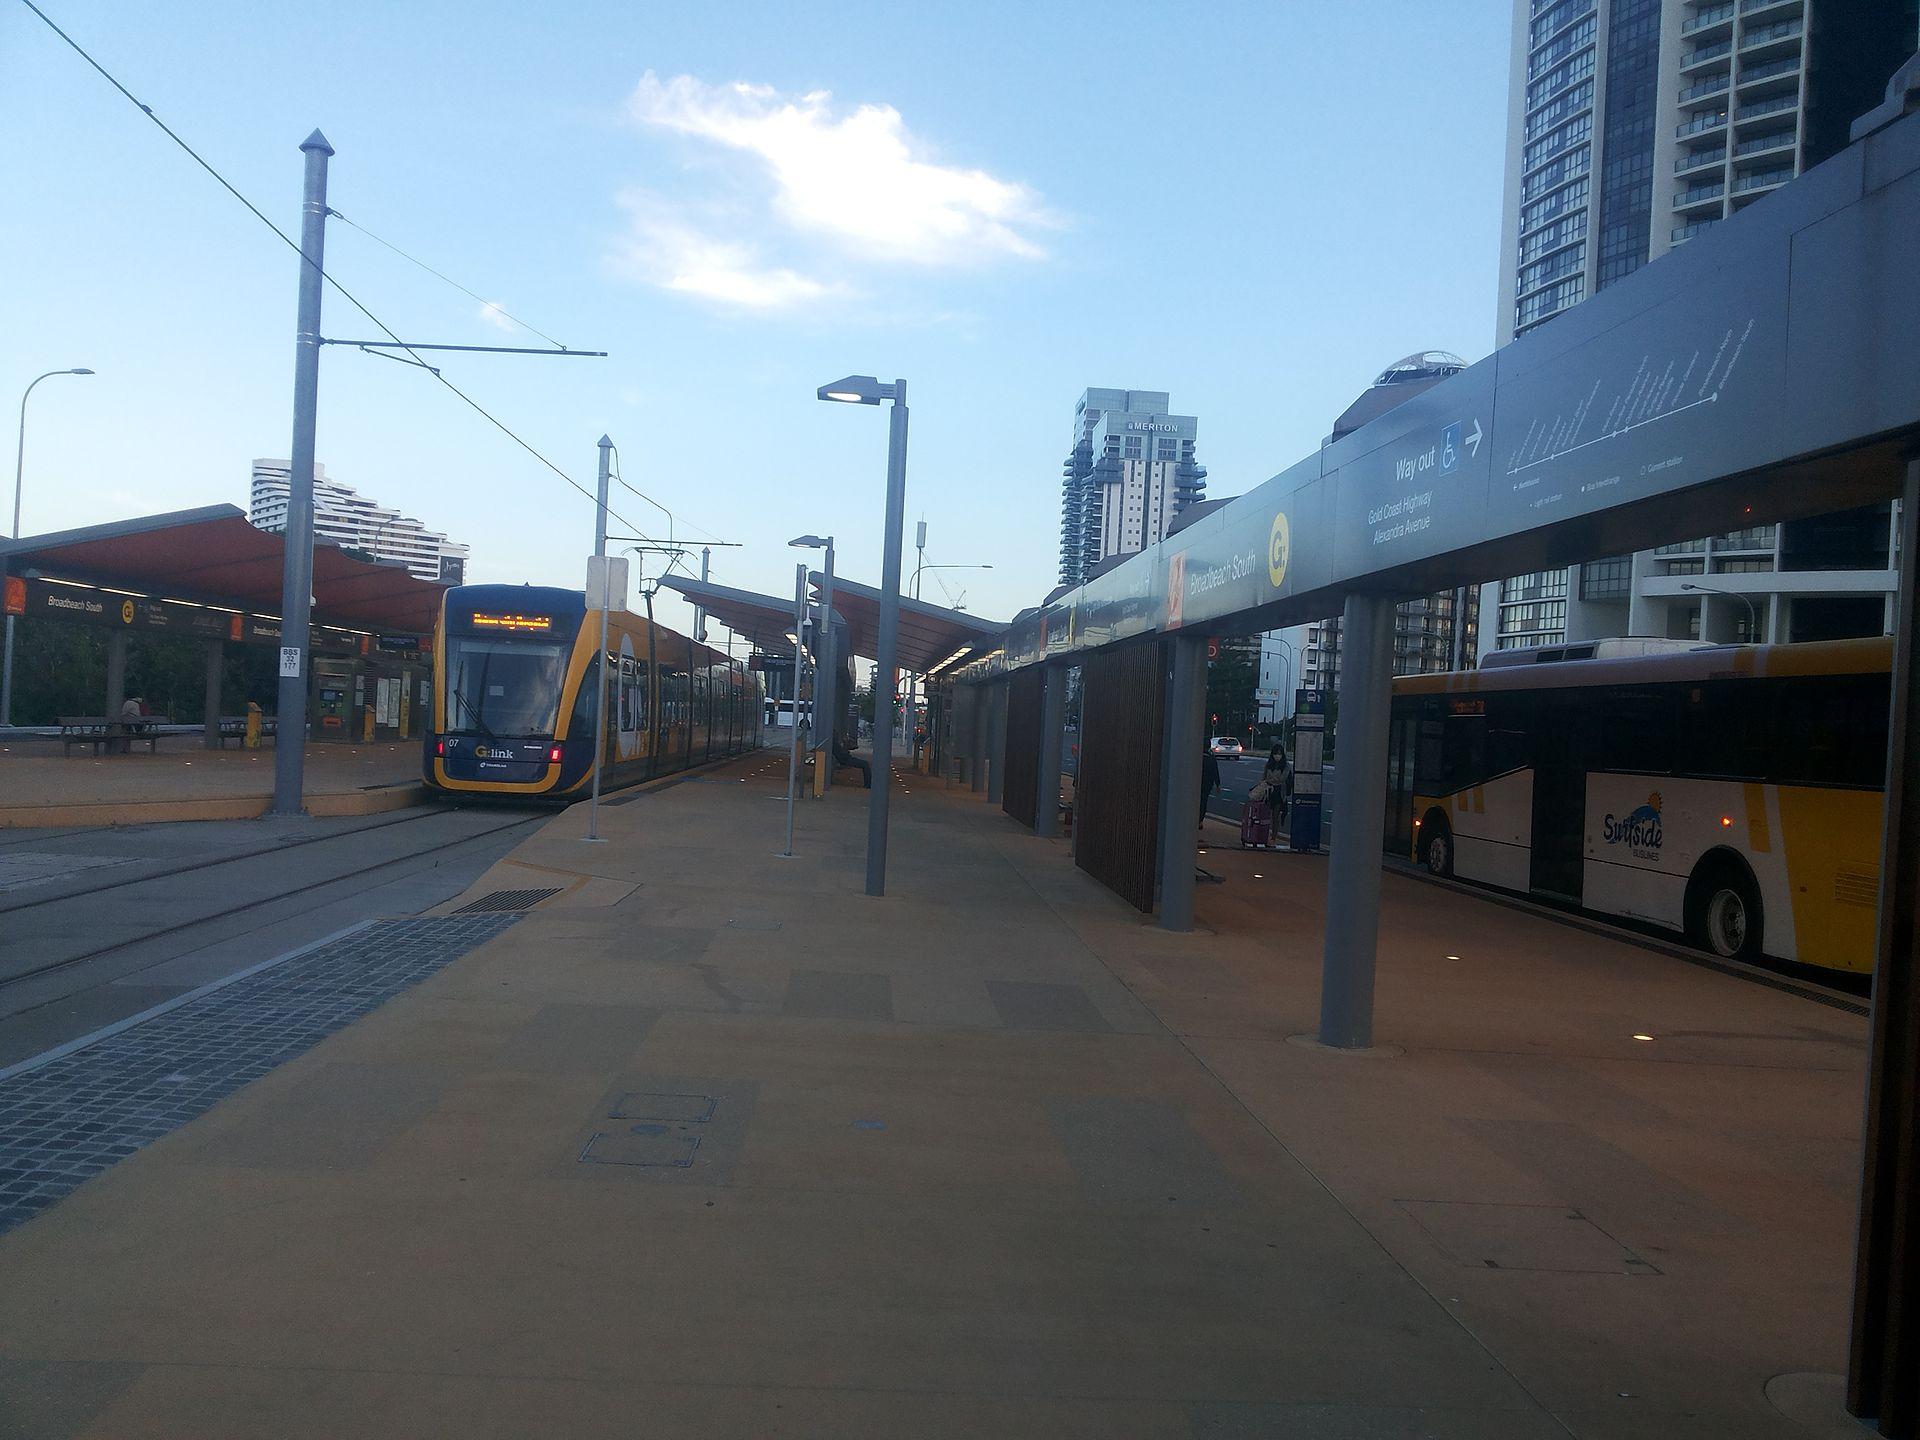 Closest train station to jupiters casino gold coast